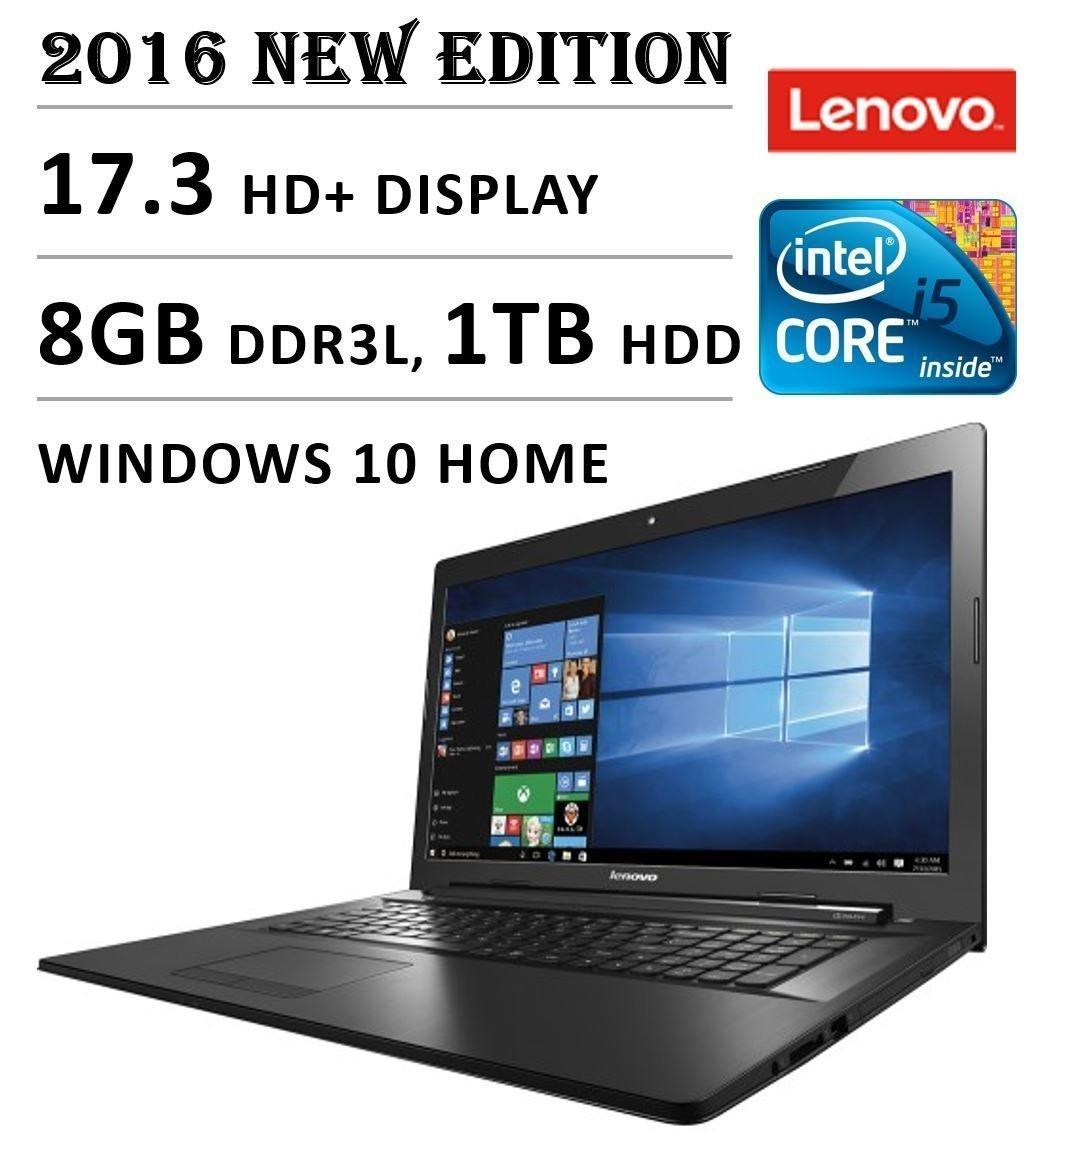 Lenovo G70 80 173 Laptop Core I5 5200u 3m Cache Up Lcd Led 140 Inc Ideapad G40 30 70 To 22 Ghz 8gb Ram 1tb Hdd Windows 10 Black Computers Accessories